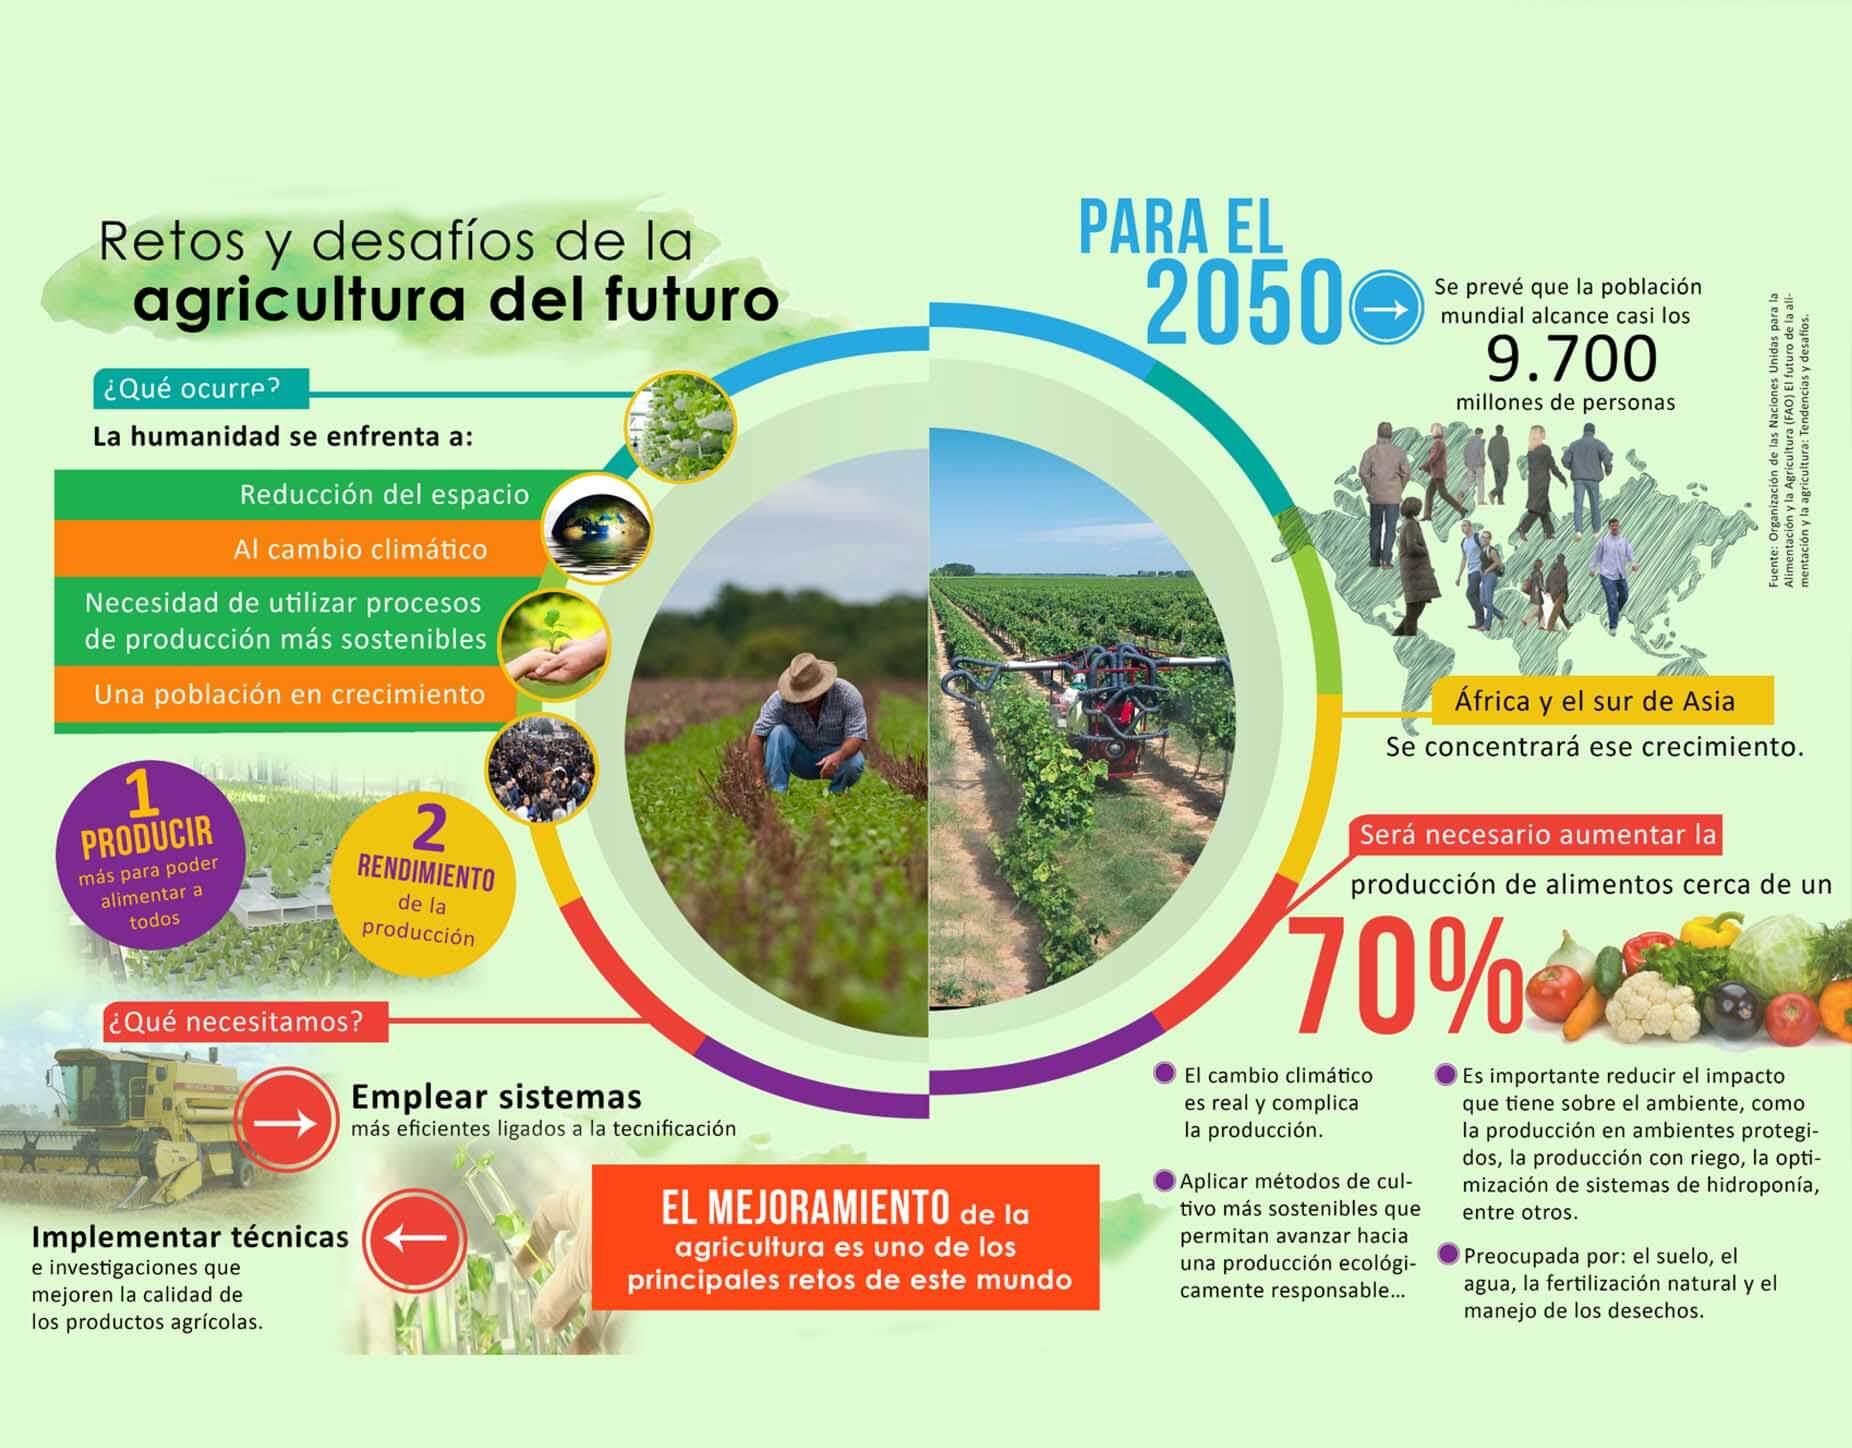 El futuro toca a las puertas de la agricultura pensis - Casa asia empleo ...